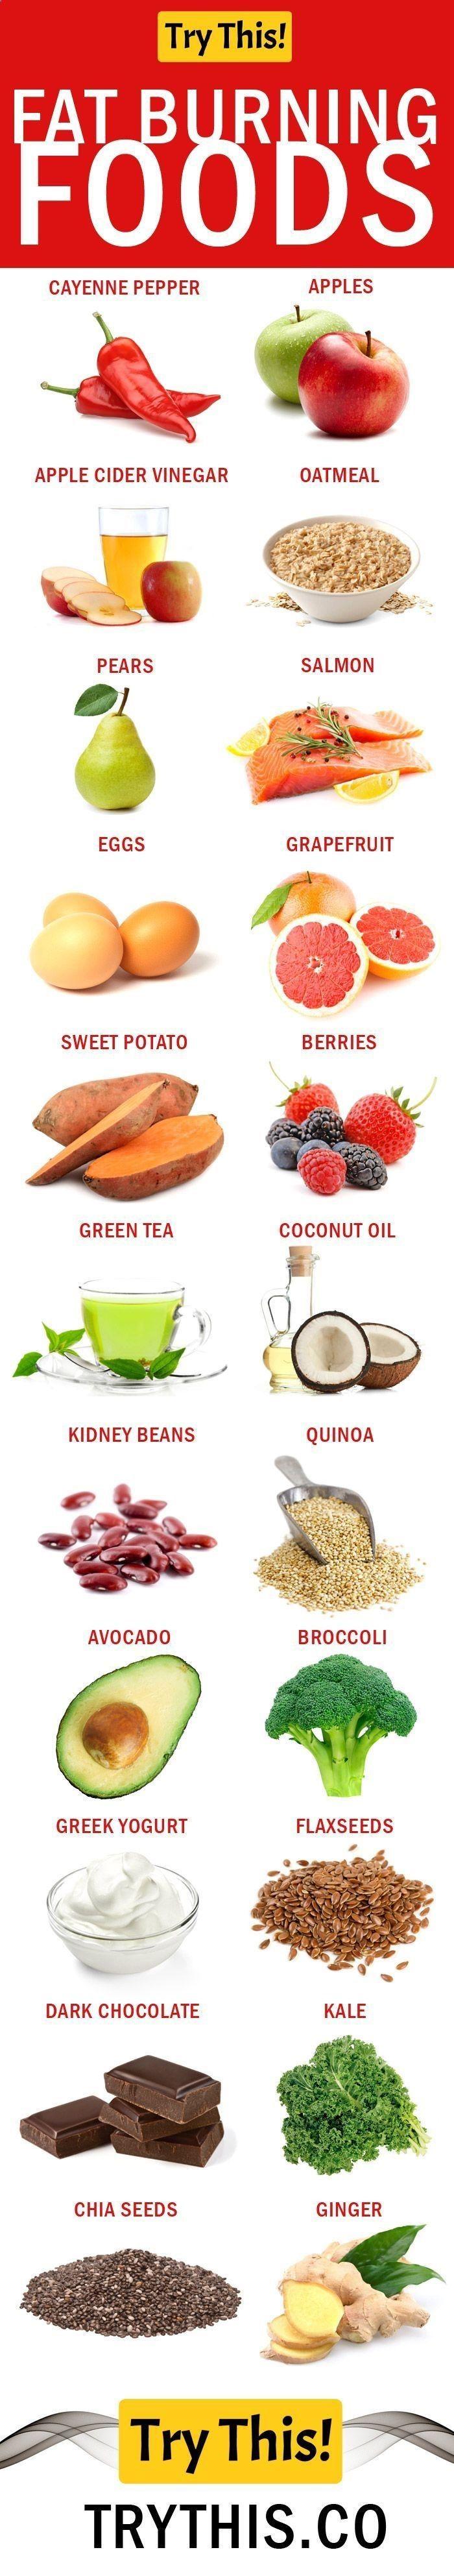 Foods That Burn Fat List